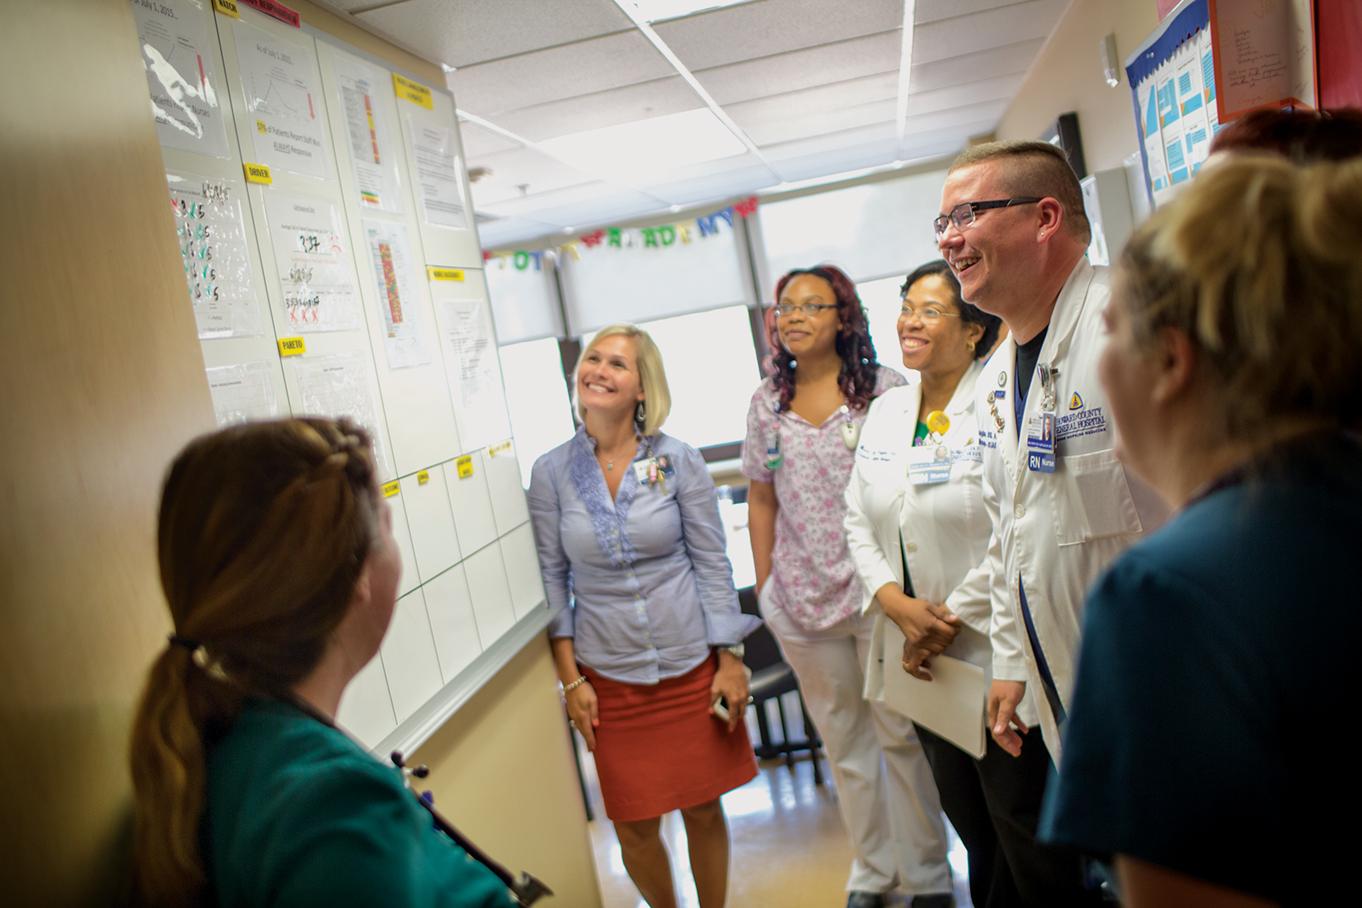 The Polite Pause Johns Hopkins Nursing Magazine